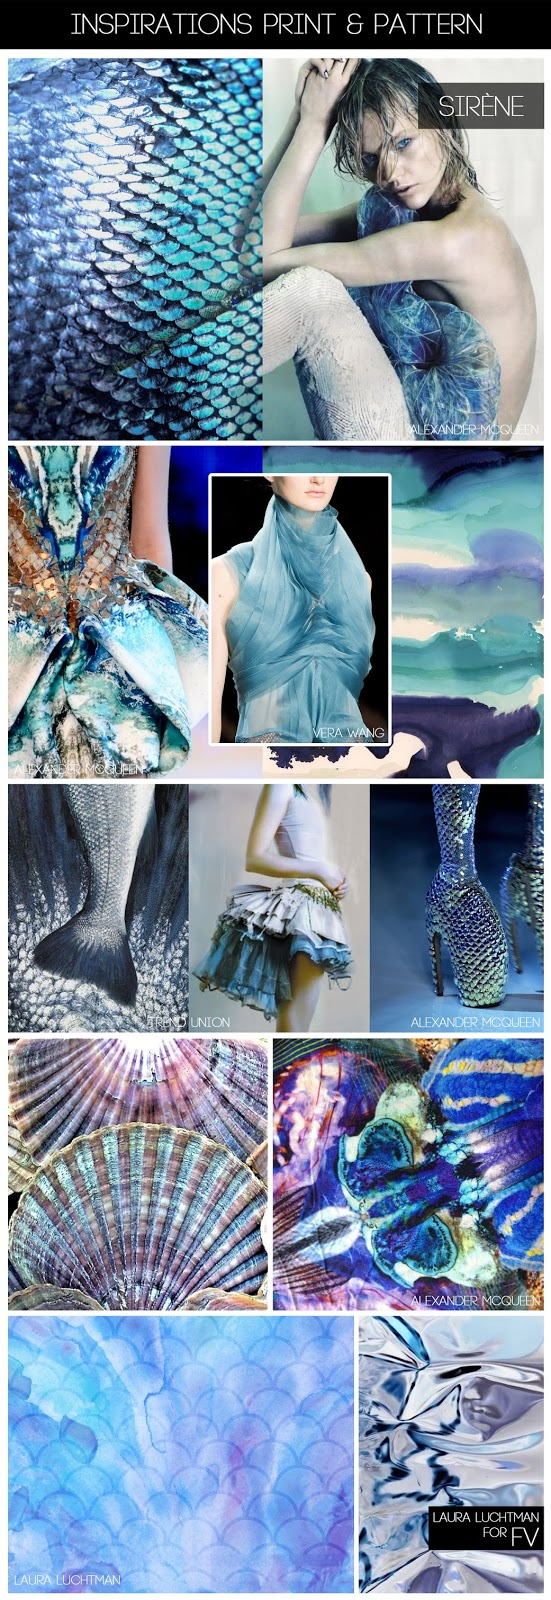 Print & Pattern Inspiration: Sirène © Laura Luchtman for Fashion Vignette